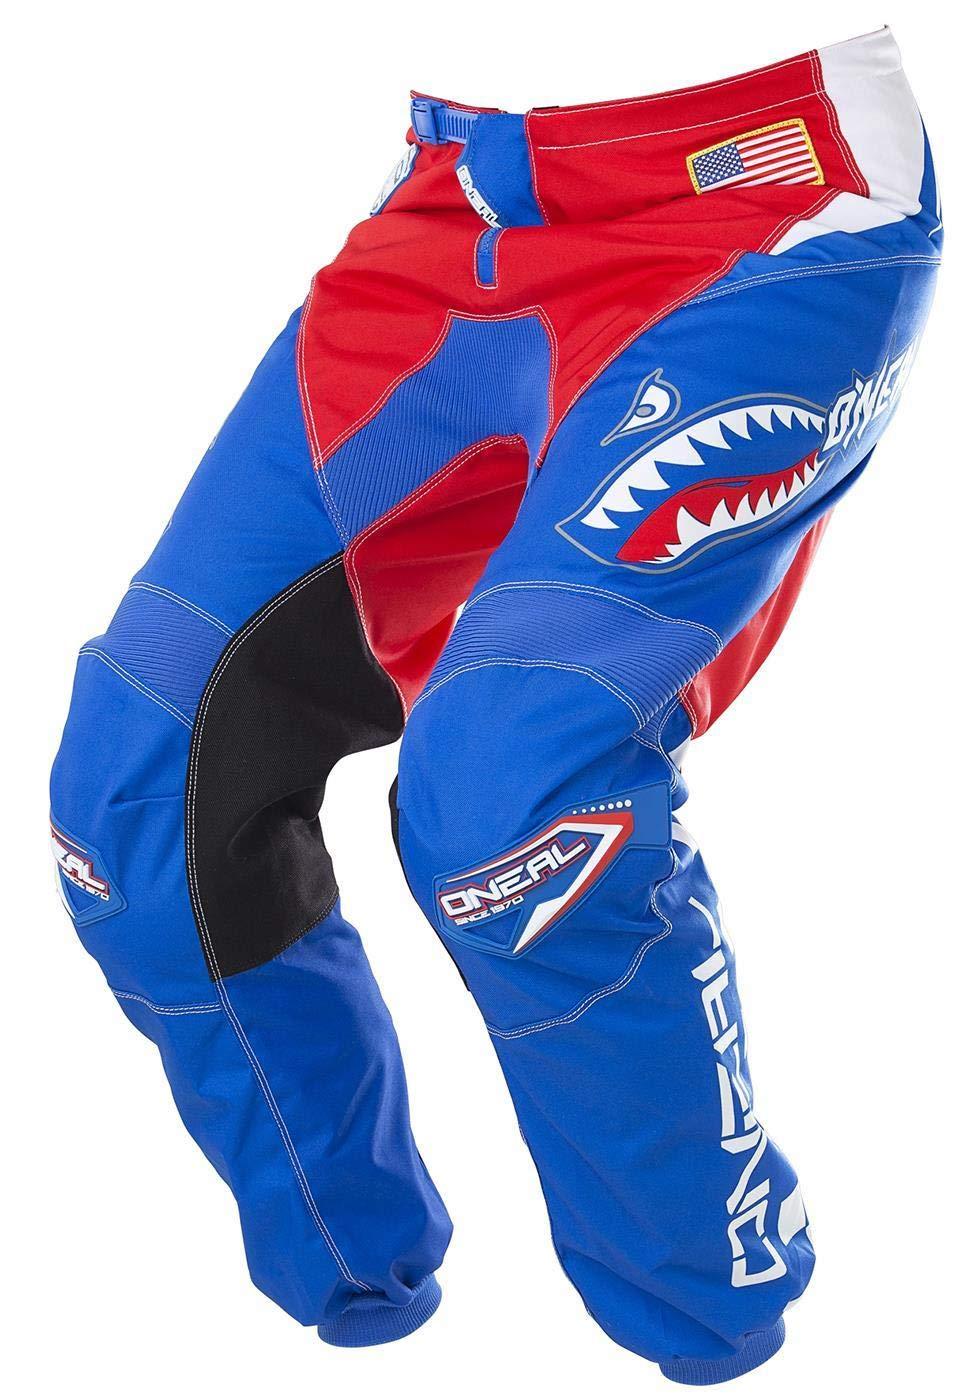 O'Neal Element Men's Afterburner Pant (Blue/Red, 32) O' Neal 0128-862